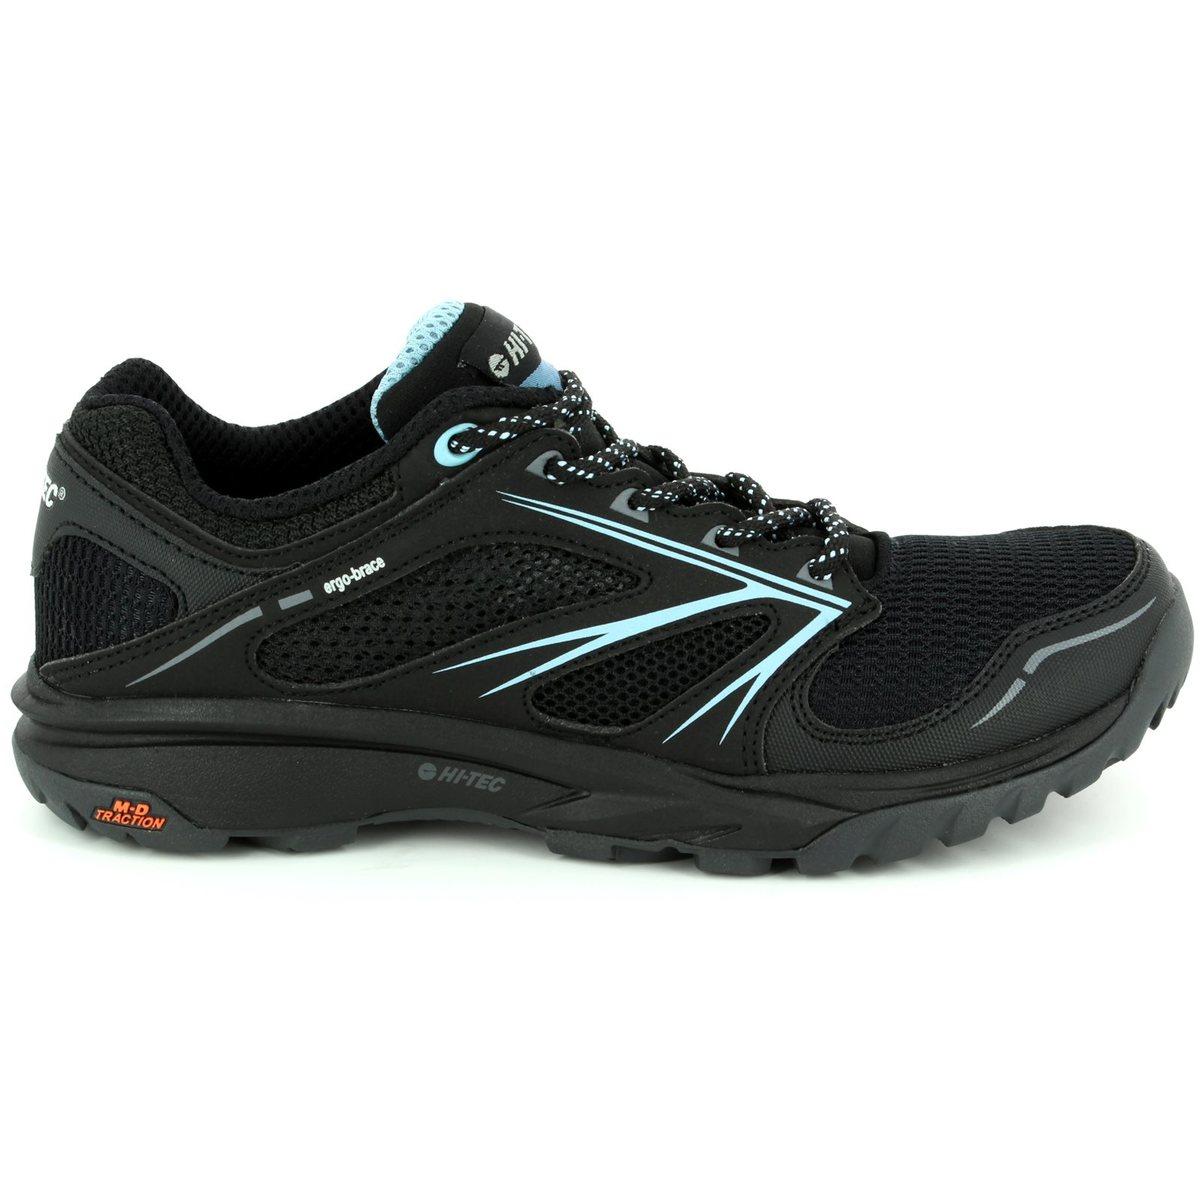 hi tec speed 6254 21 black multi lacing shoes